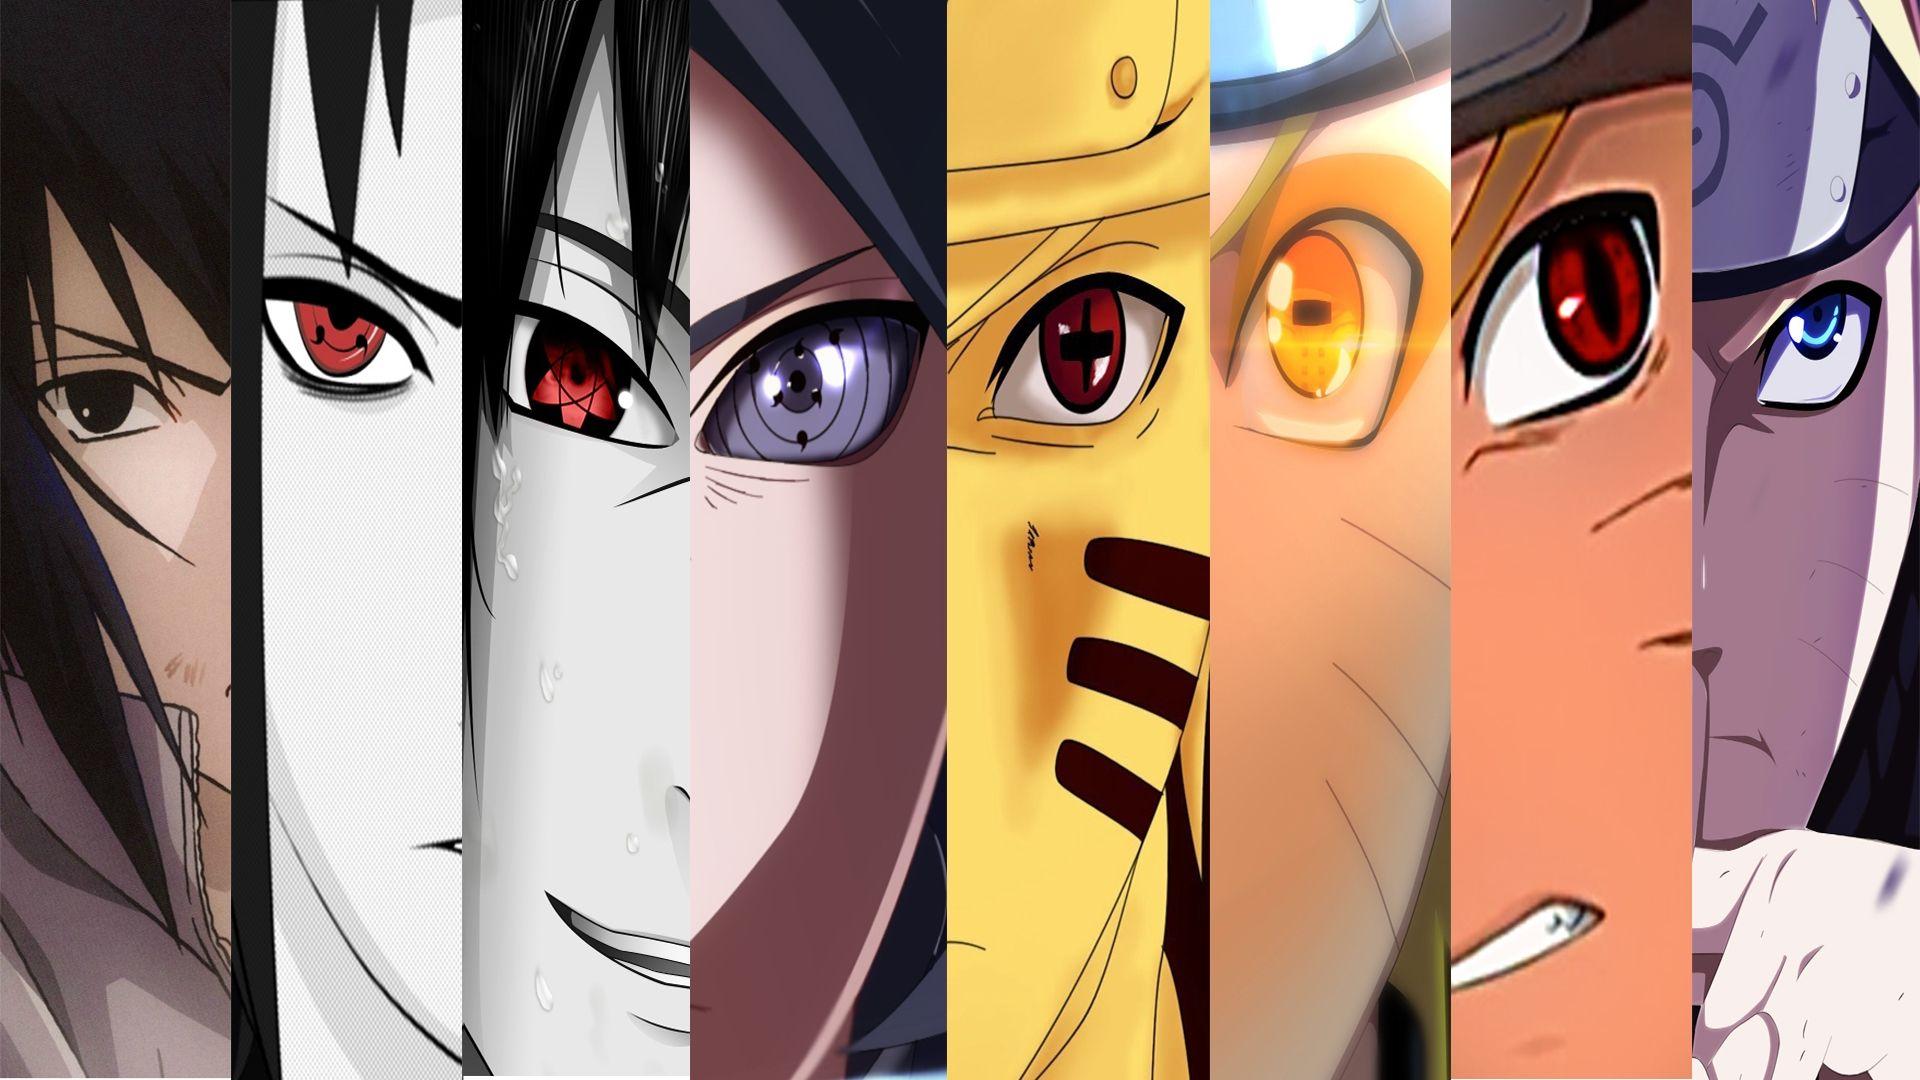 Naruto And Sasukeart, Background